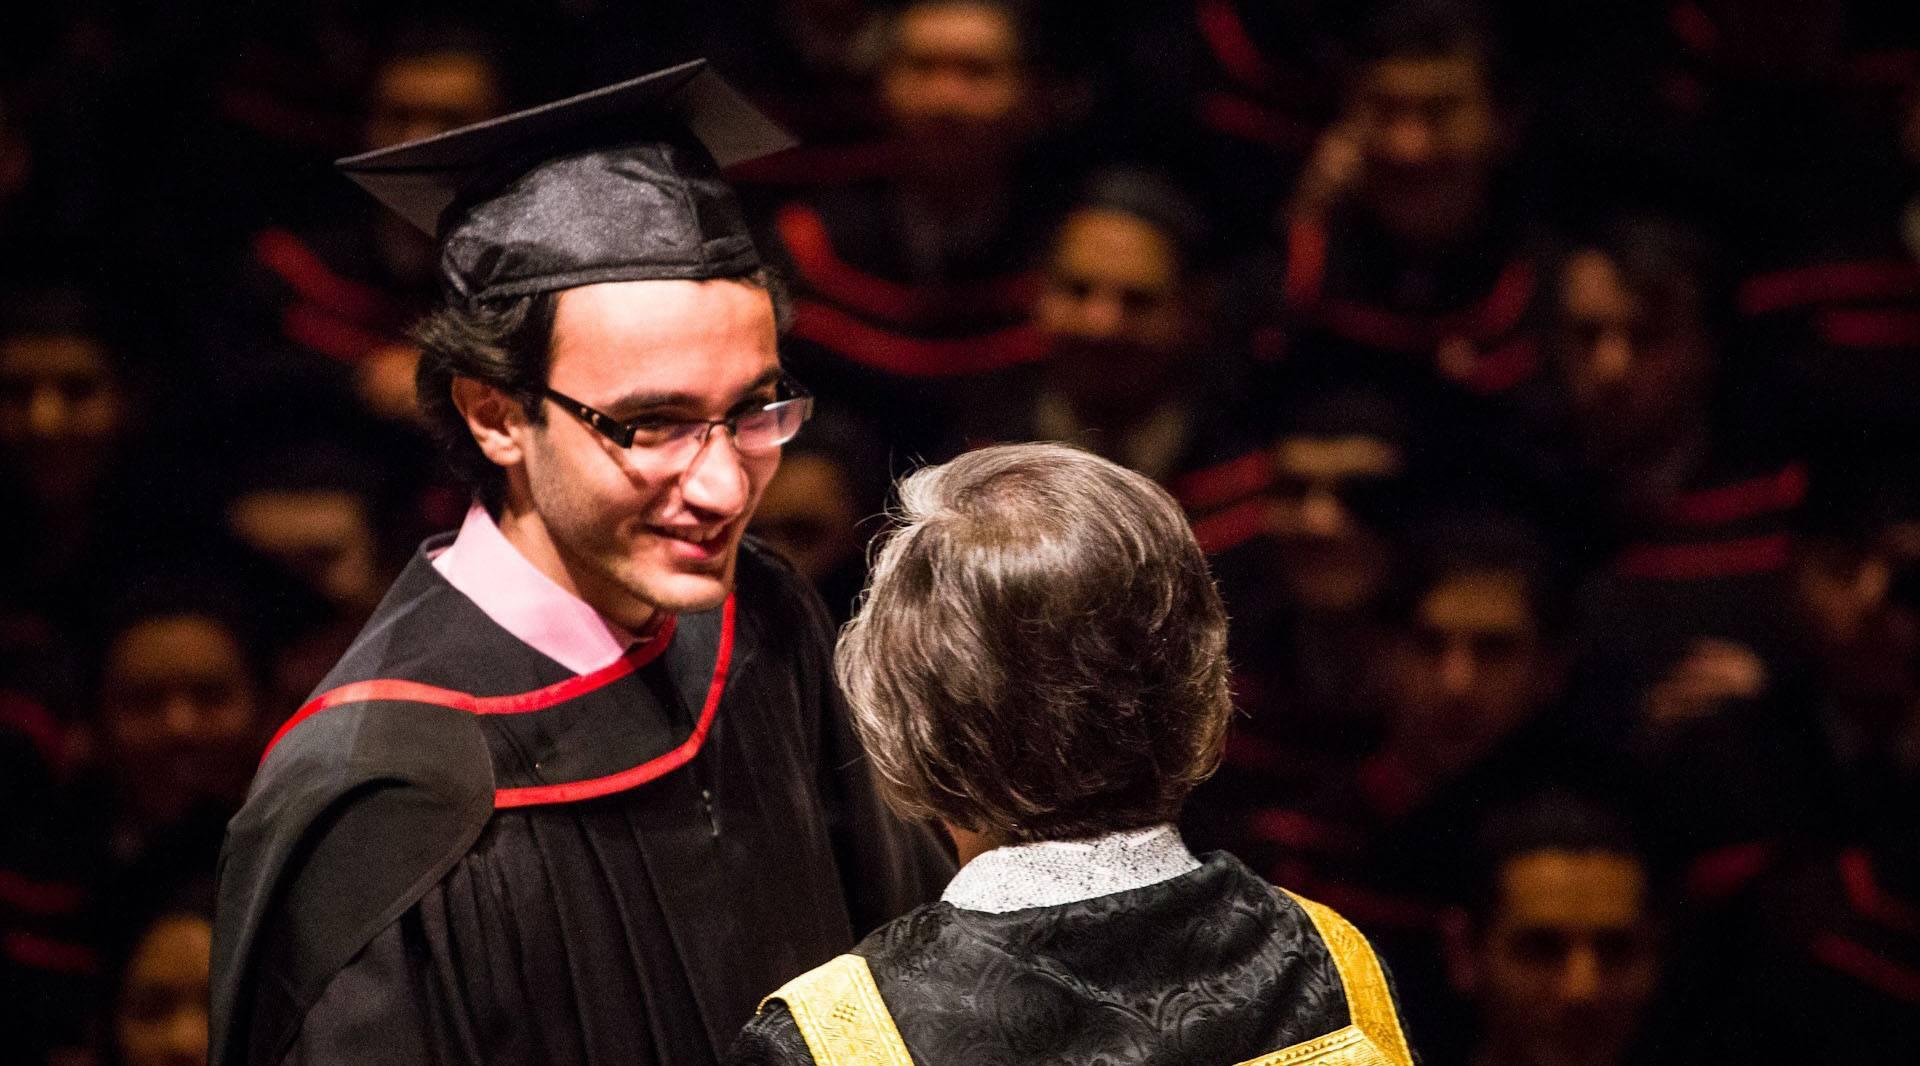 Murtadha Al-Tameemi graduating from UBC in 2013 (Murtadha Al-Tameemi/Facebook)